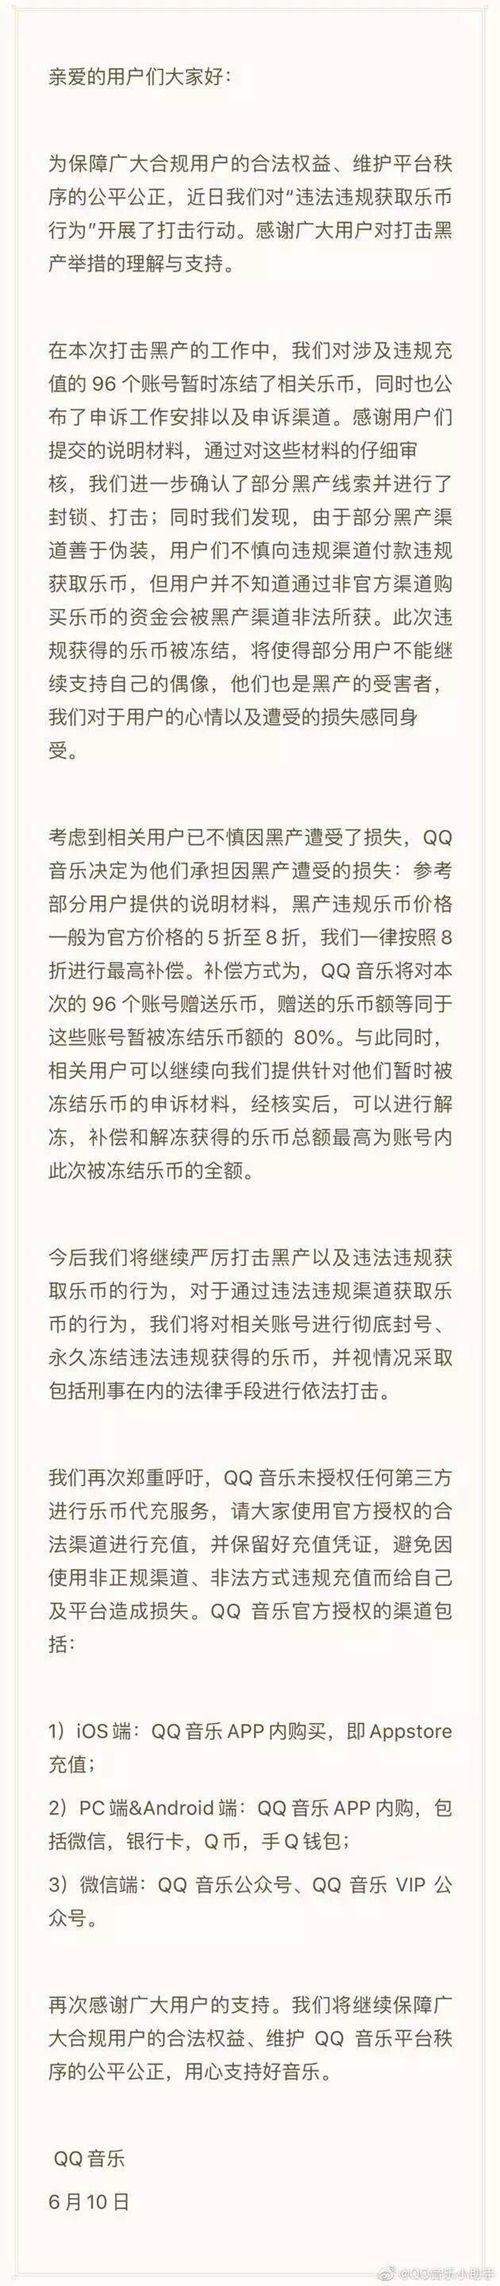 QQ音乐最新公告。